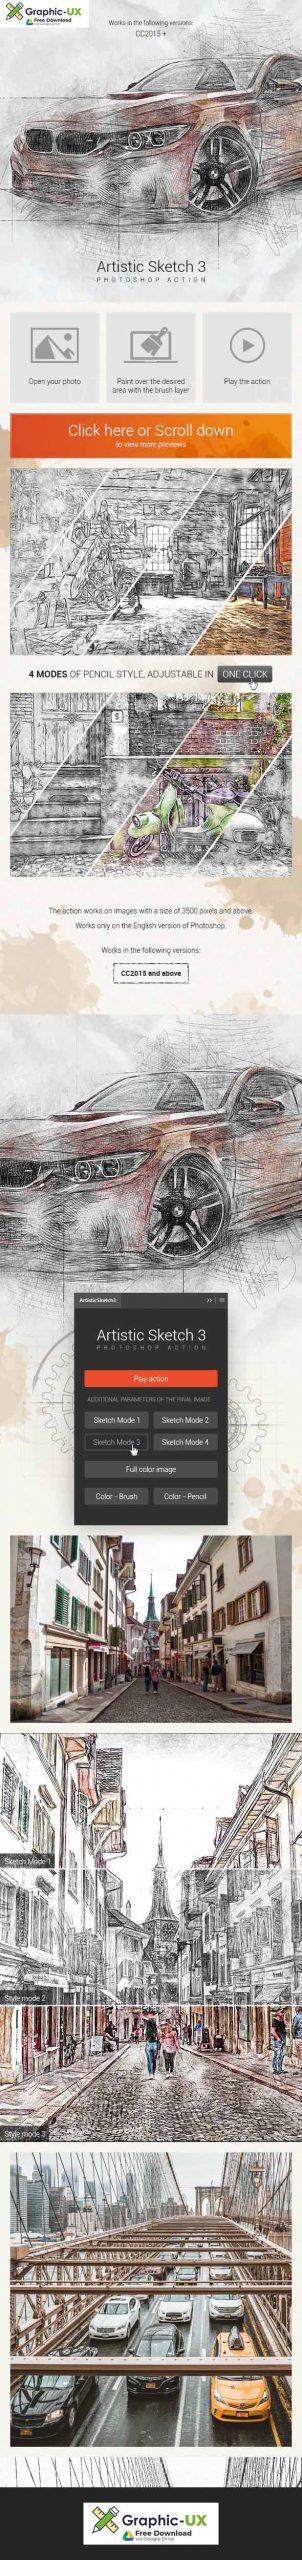 Artistic Sketch 3 Photoshop Action